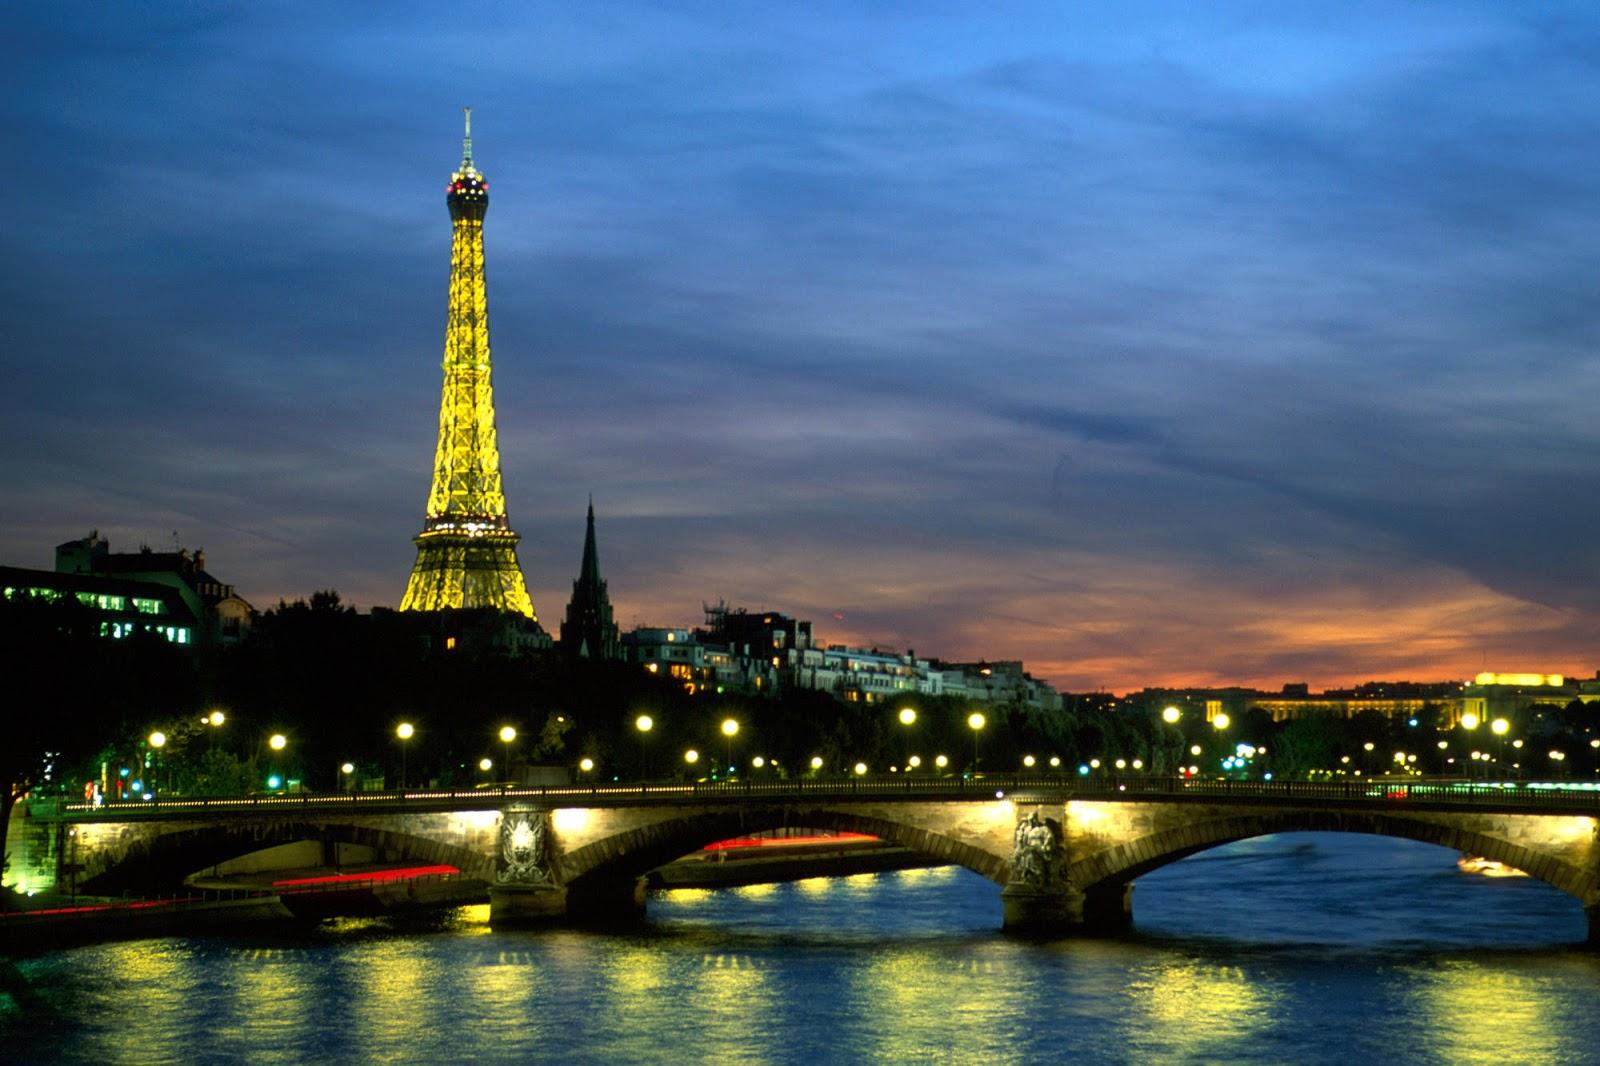 Paris at Night Wallpaper 1600x1066